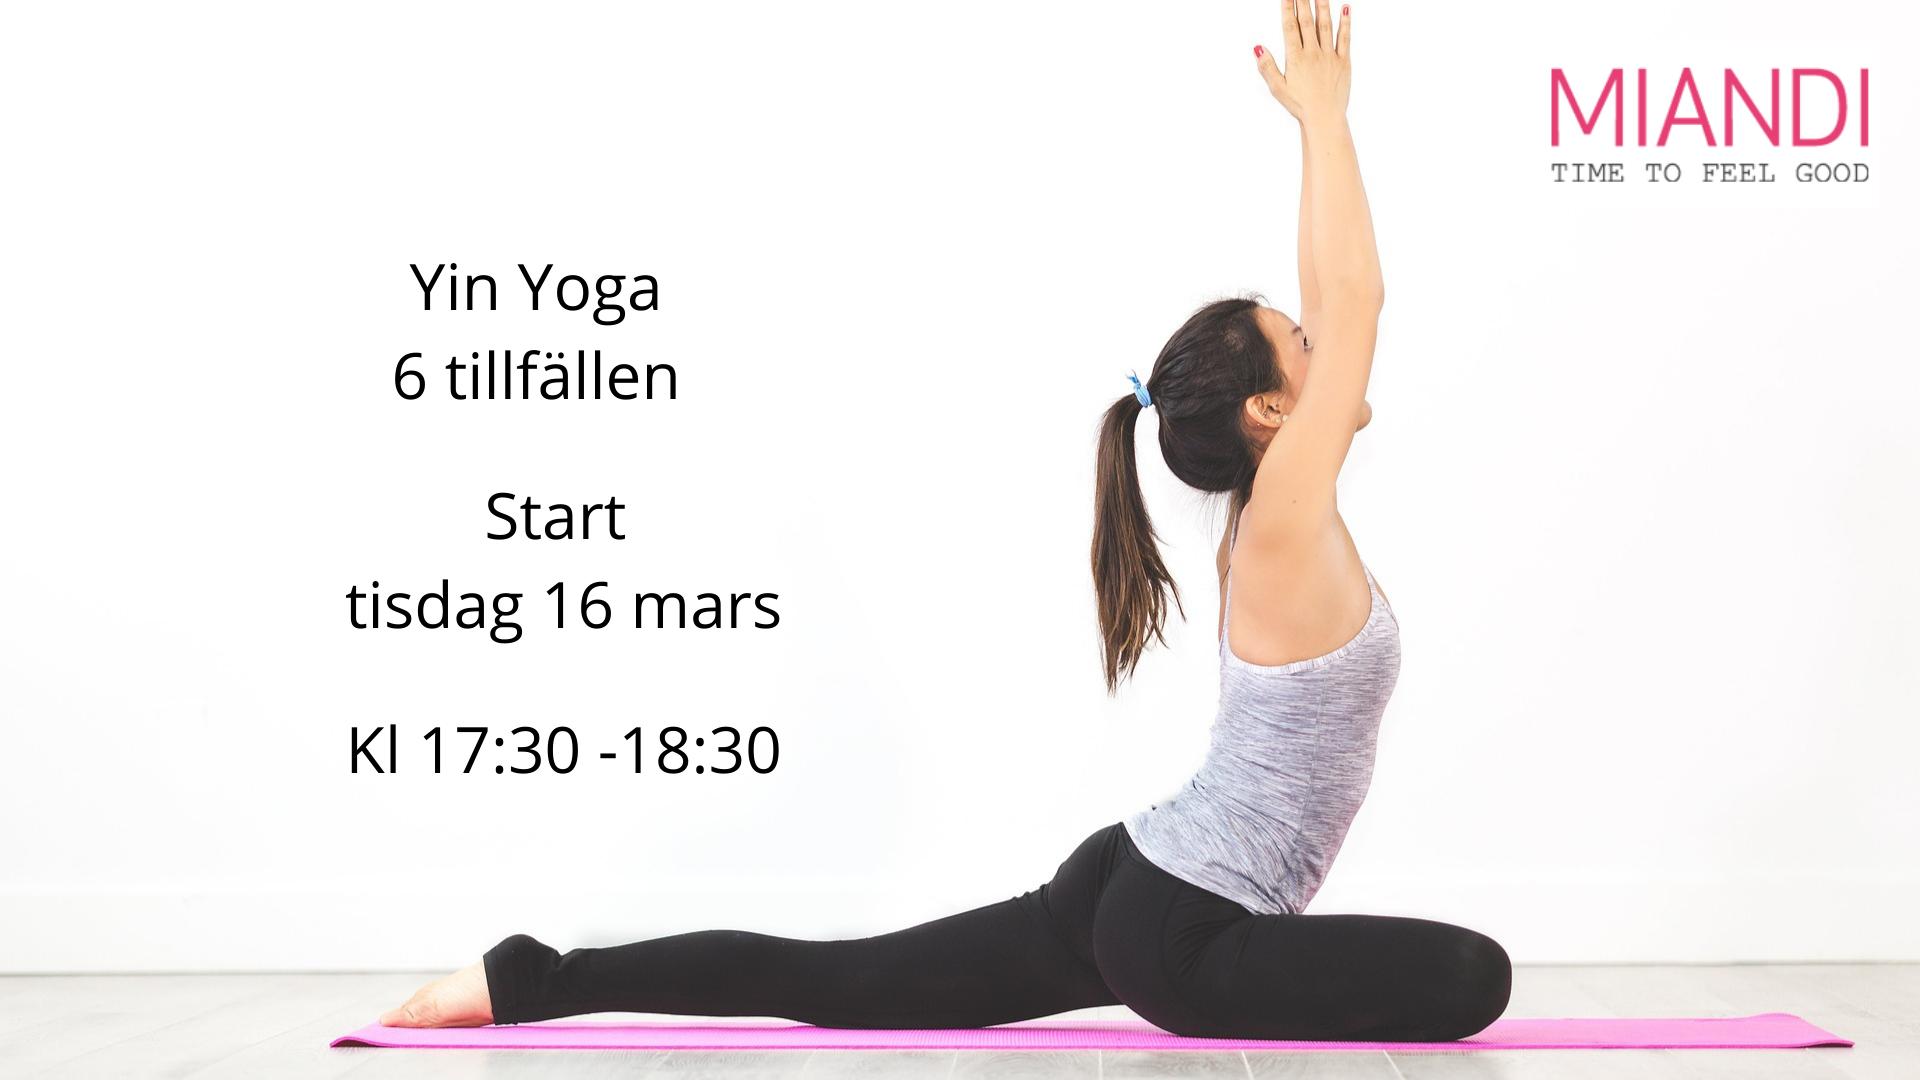 Yin Yoga 6 tillfällen start tisdag 16 mars